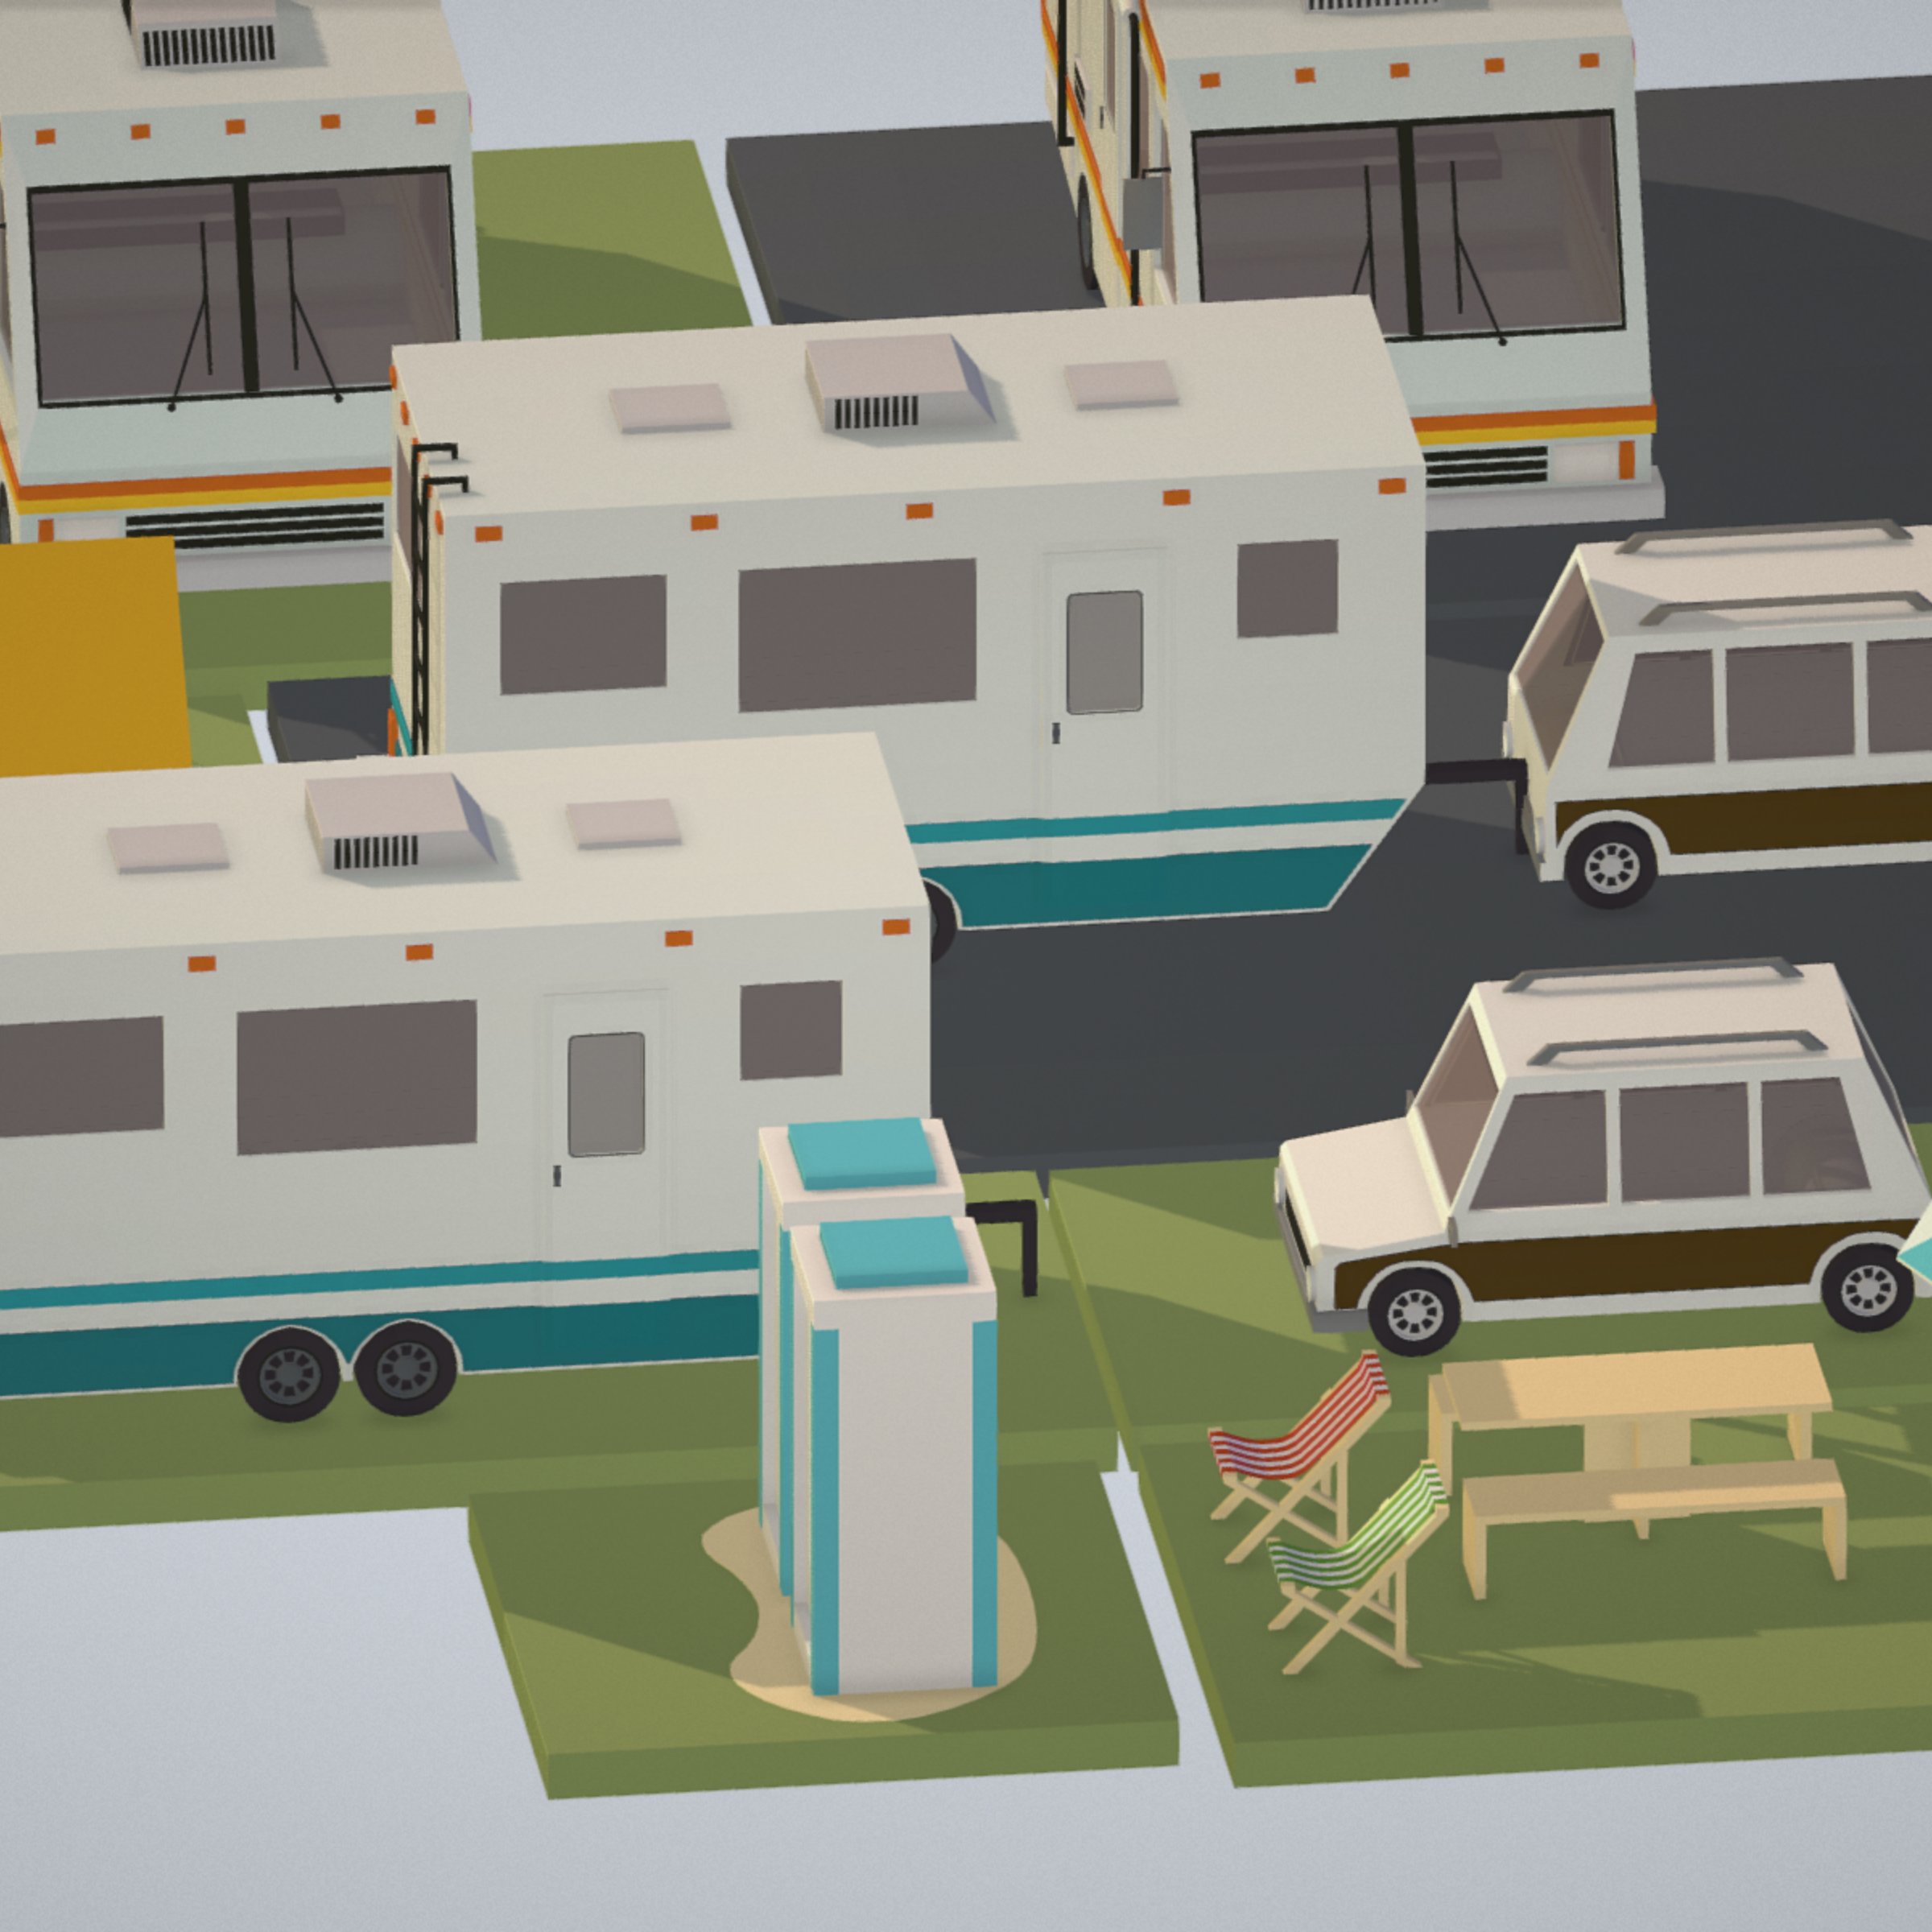 isometric transport holiday bbq camping 3d model max  fbx ma mb png obj 272018